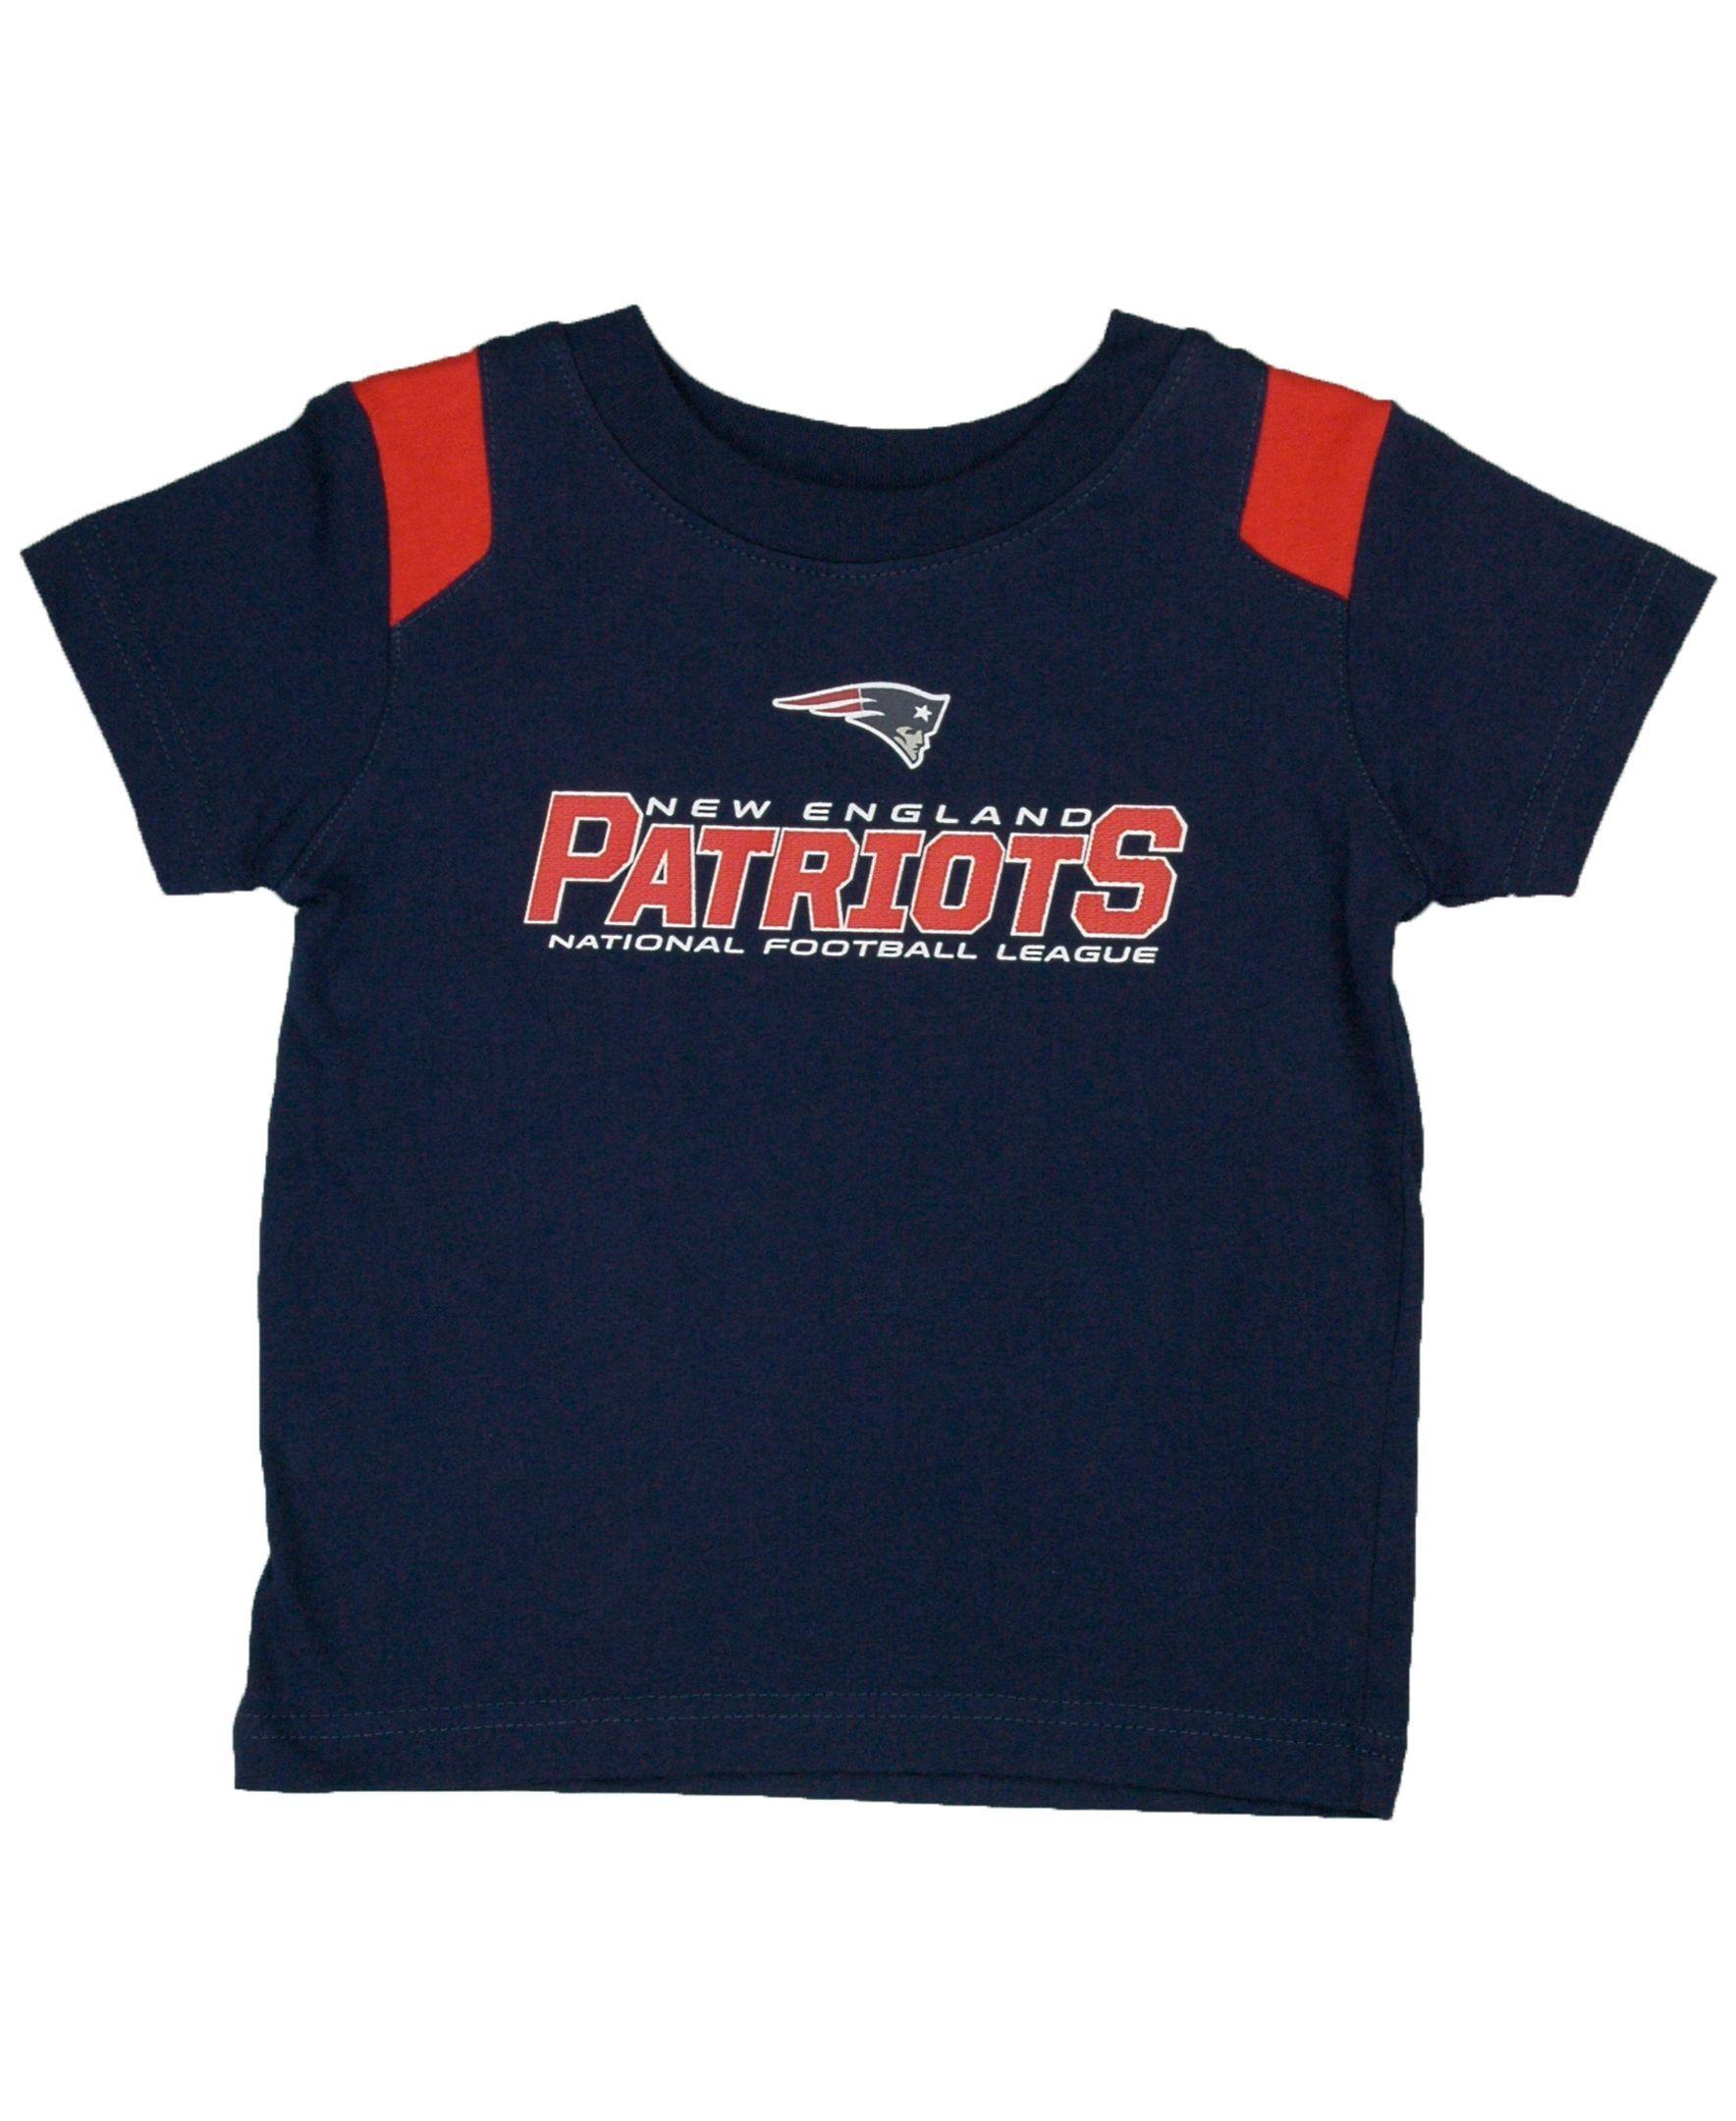 Nike Boys New England Patriots T Shirt New England Patriots Patriots Shirts